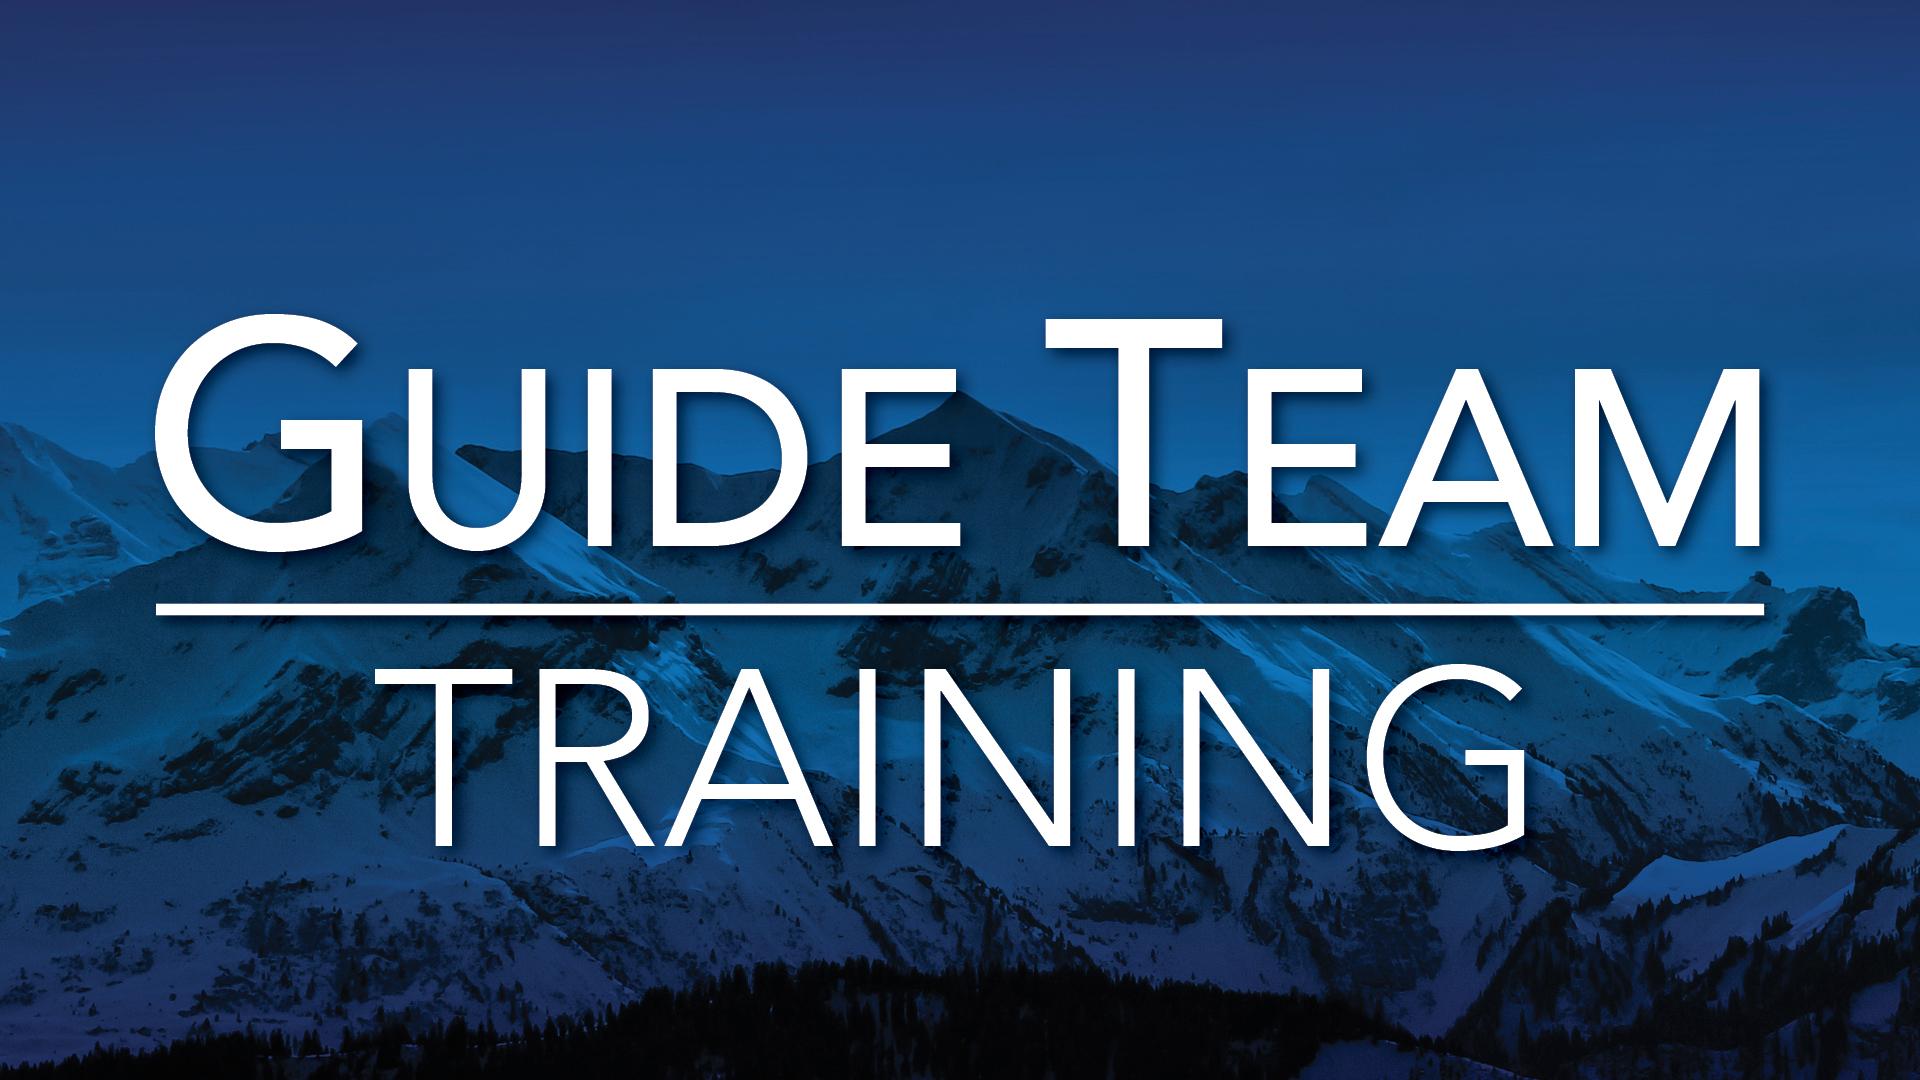 Guide Team Training.jpg